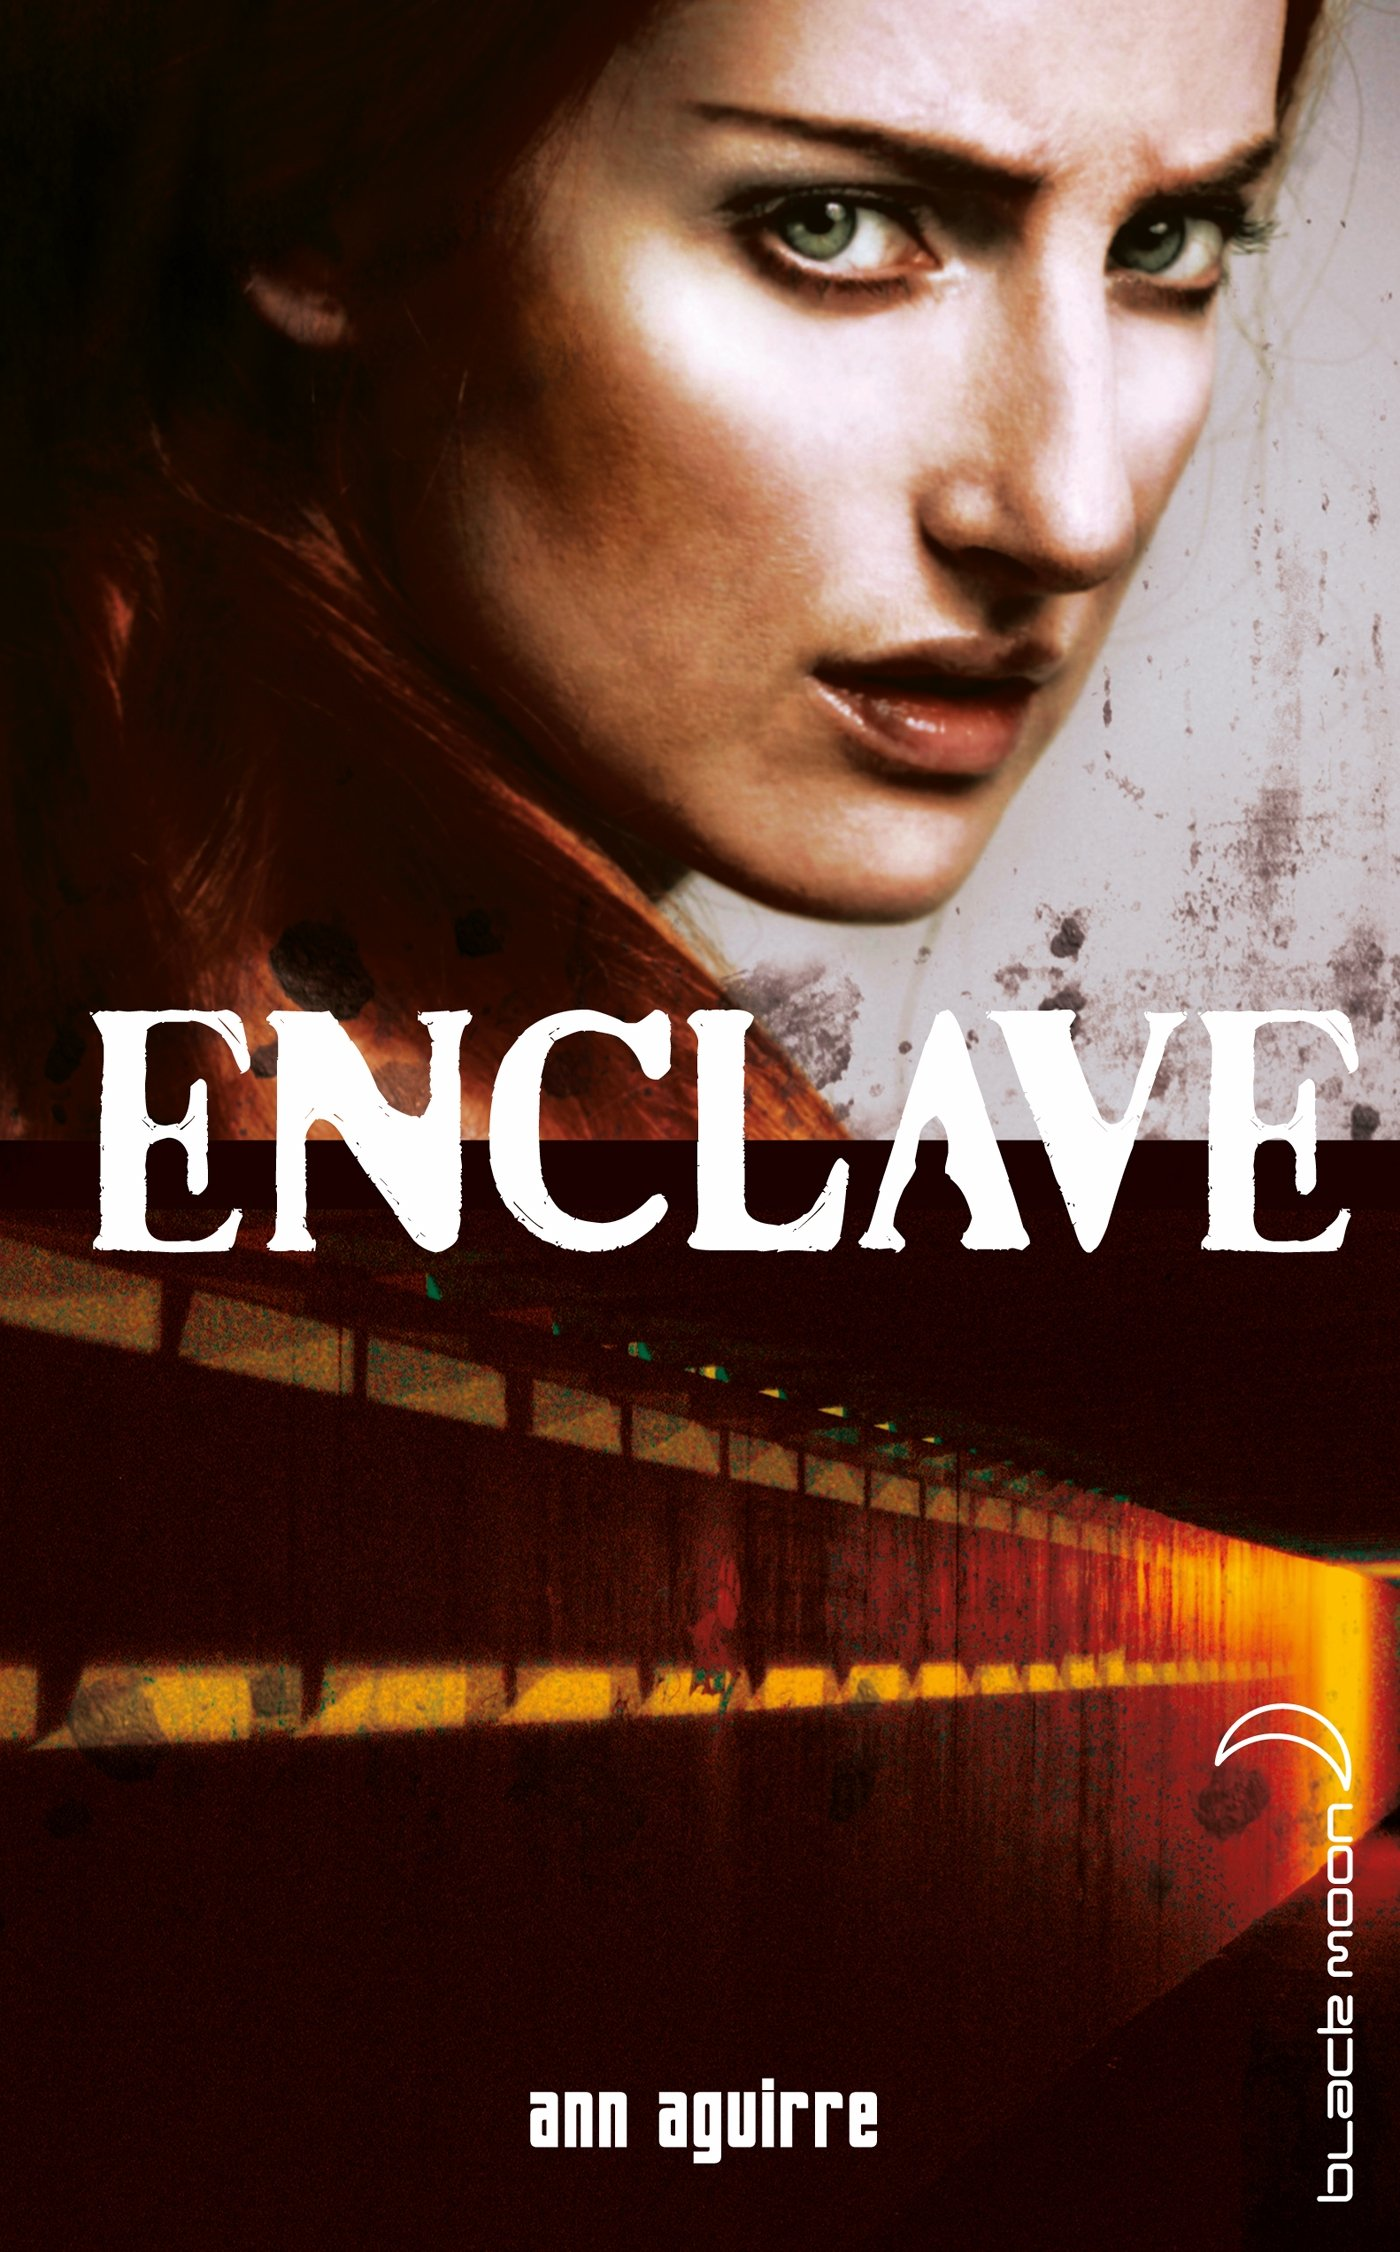 Enclave - Ann Aguirre 81m4mrzEOKL